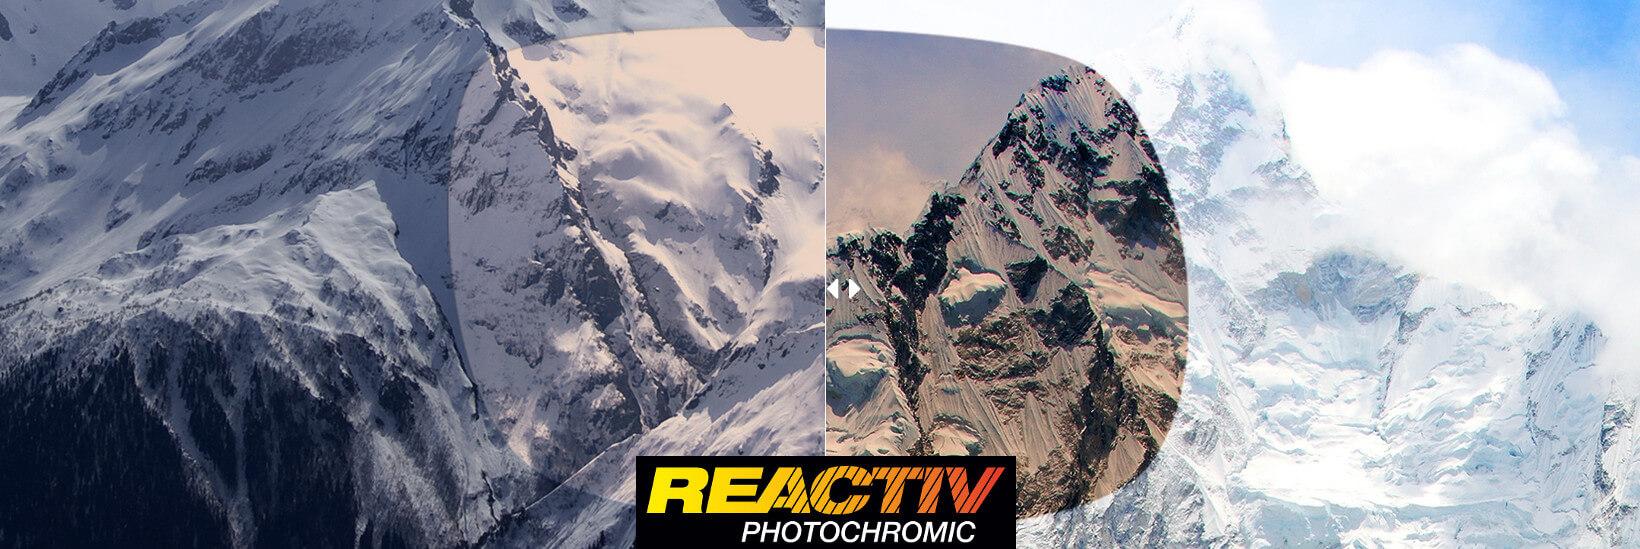 Julbo cristal REACTIV  lente- DeportesKoala Madrid Montaña-Trekking